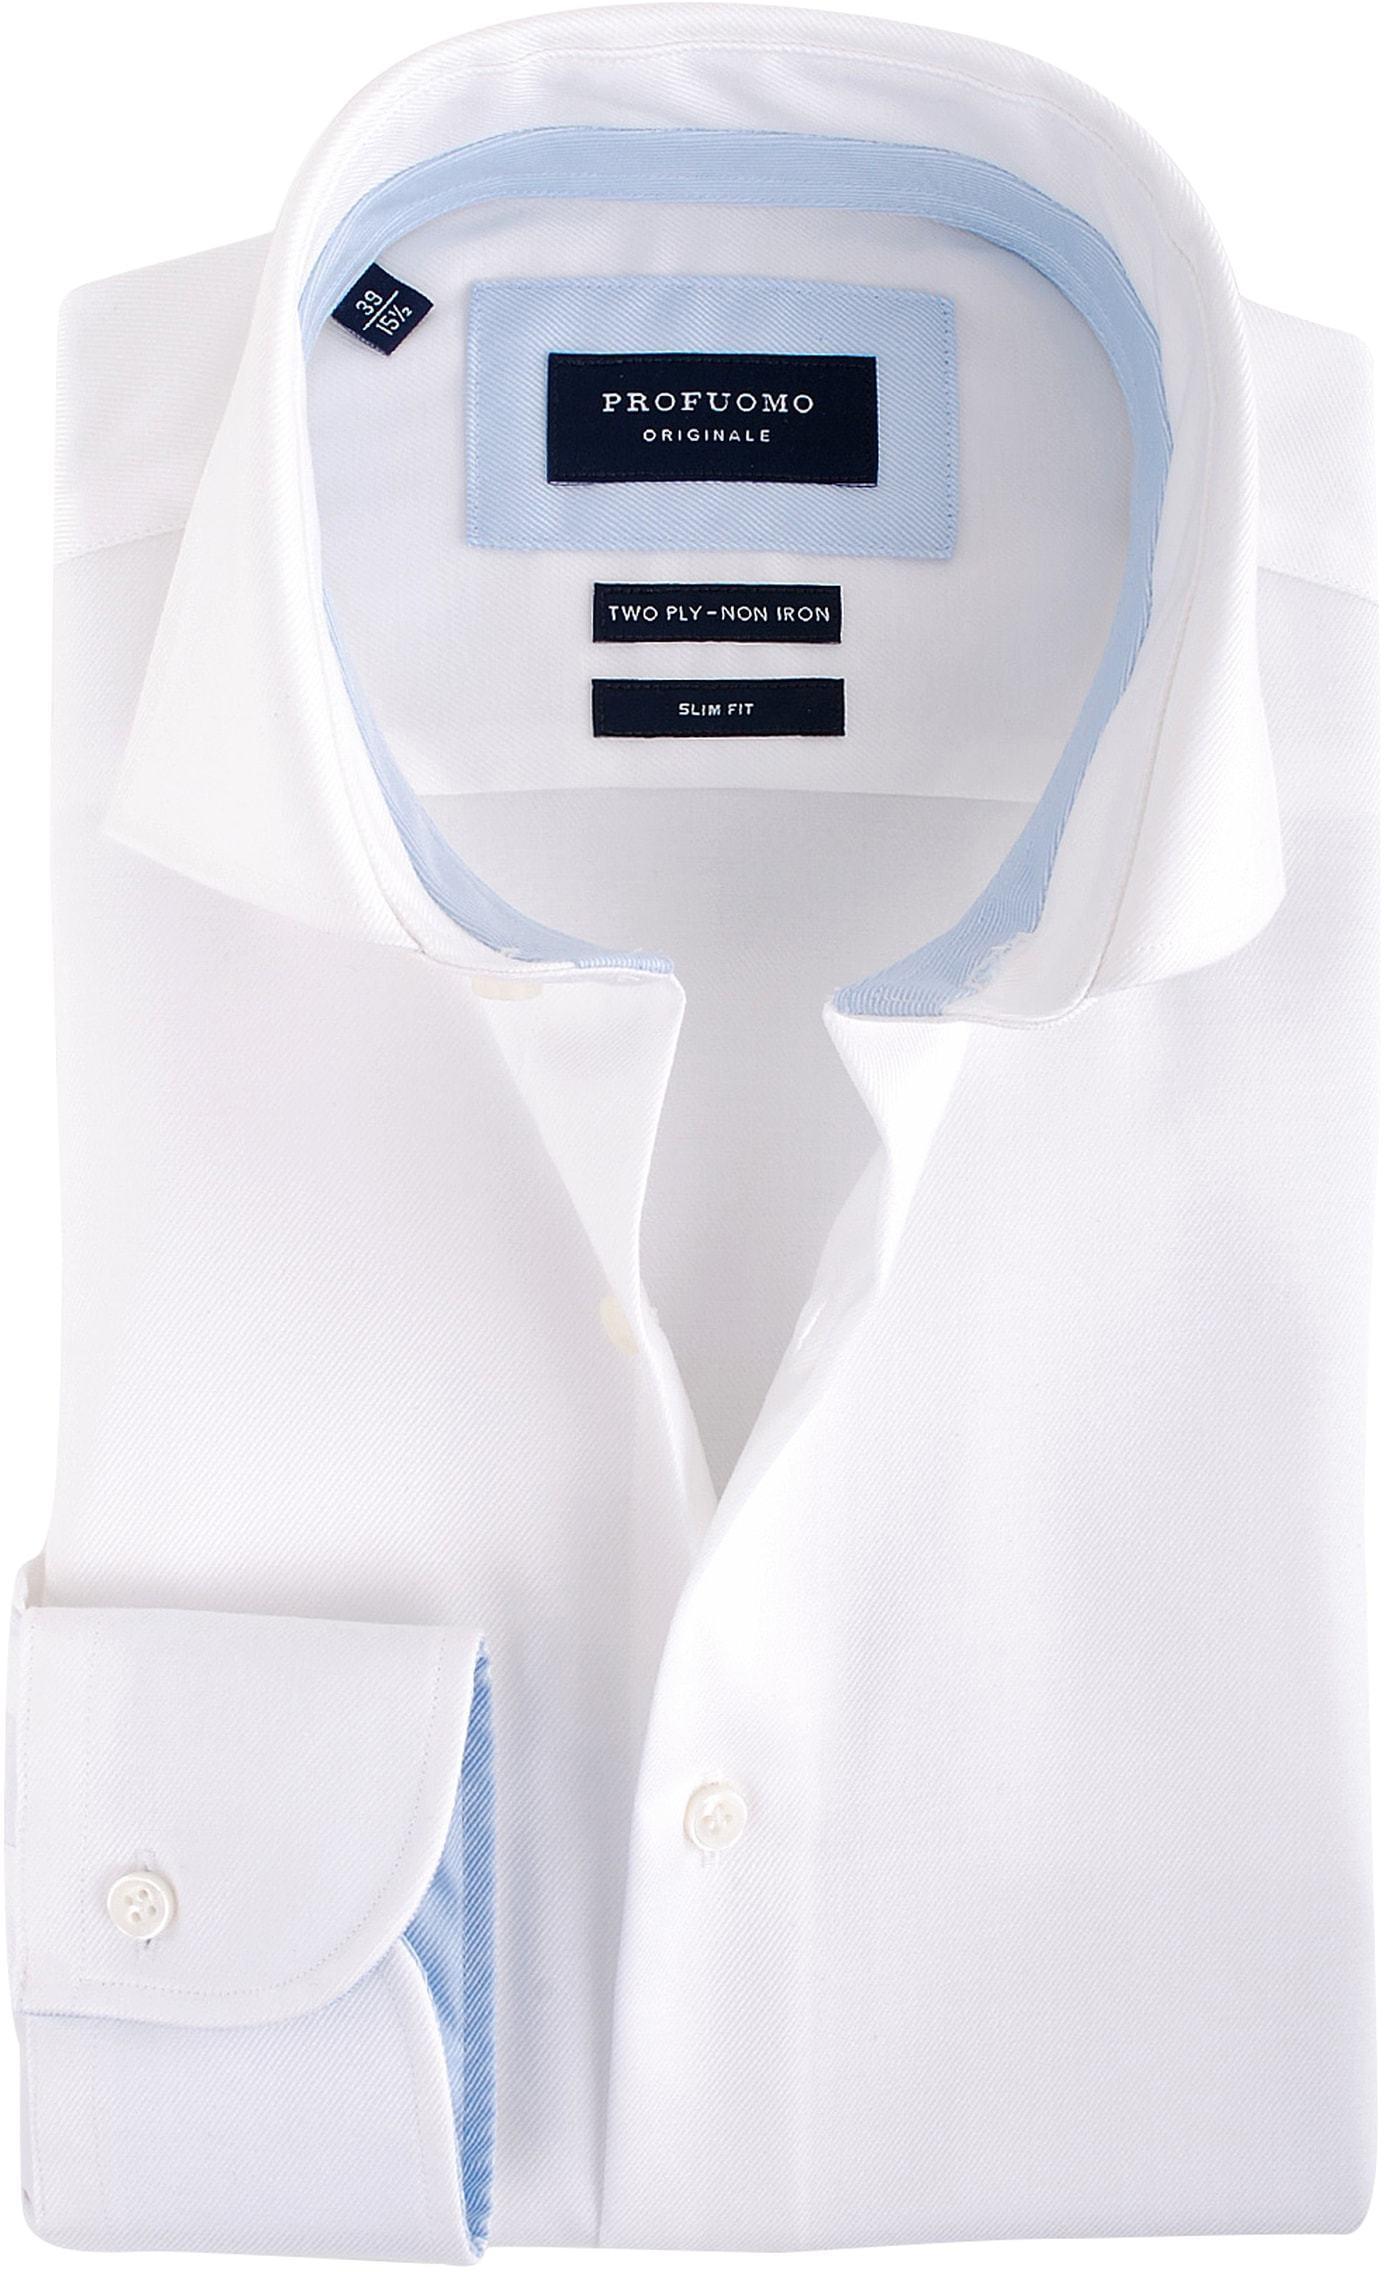 Profuomo Overhemd Wit + Blauw Contrast foto 0